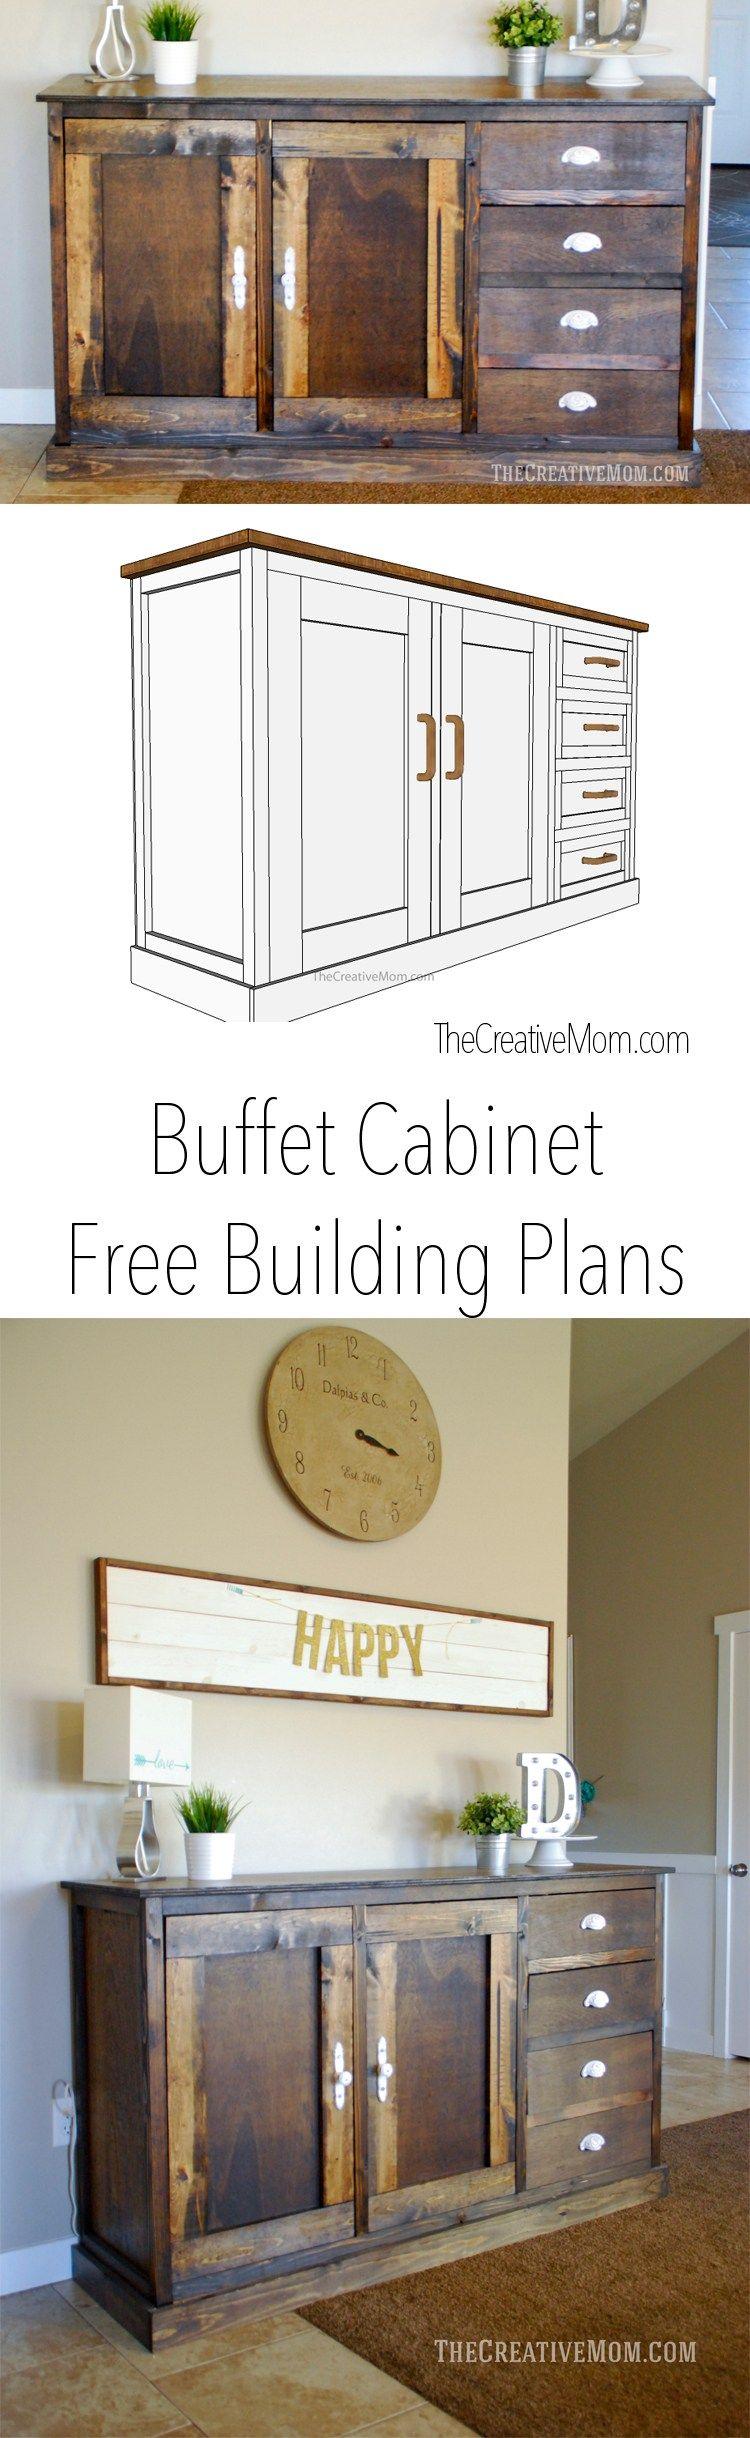 buffet cabinet free building plans dining room ideas building rh pinterest com DIY Kitchen Buffet diy outdoor buffet cabinet